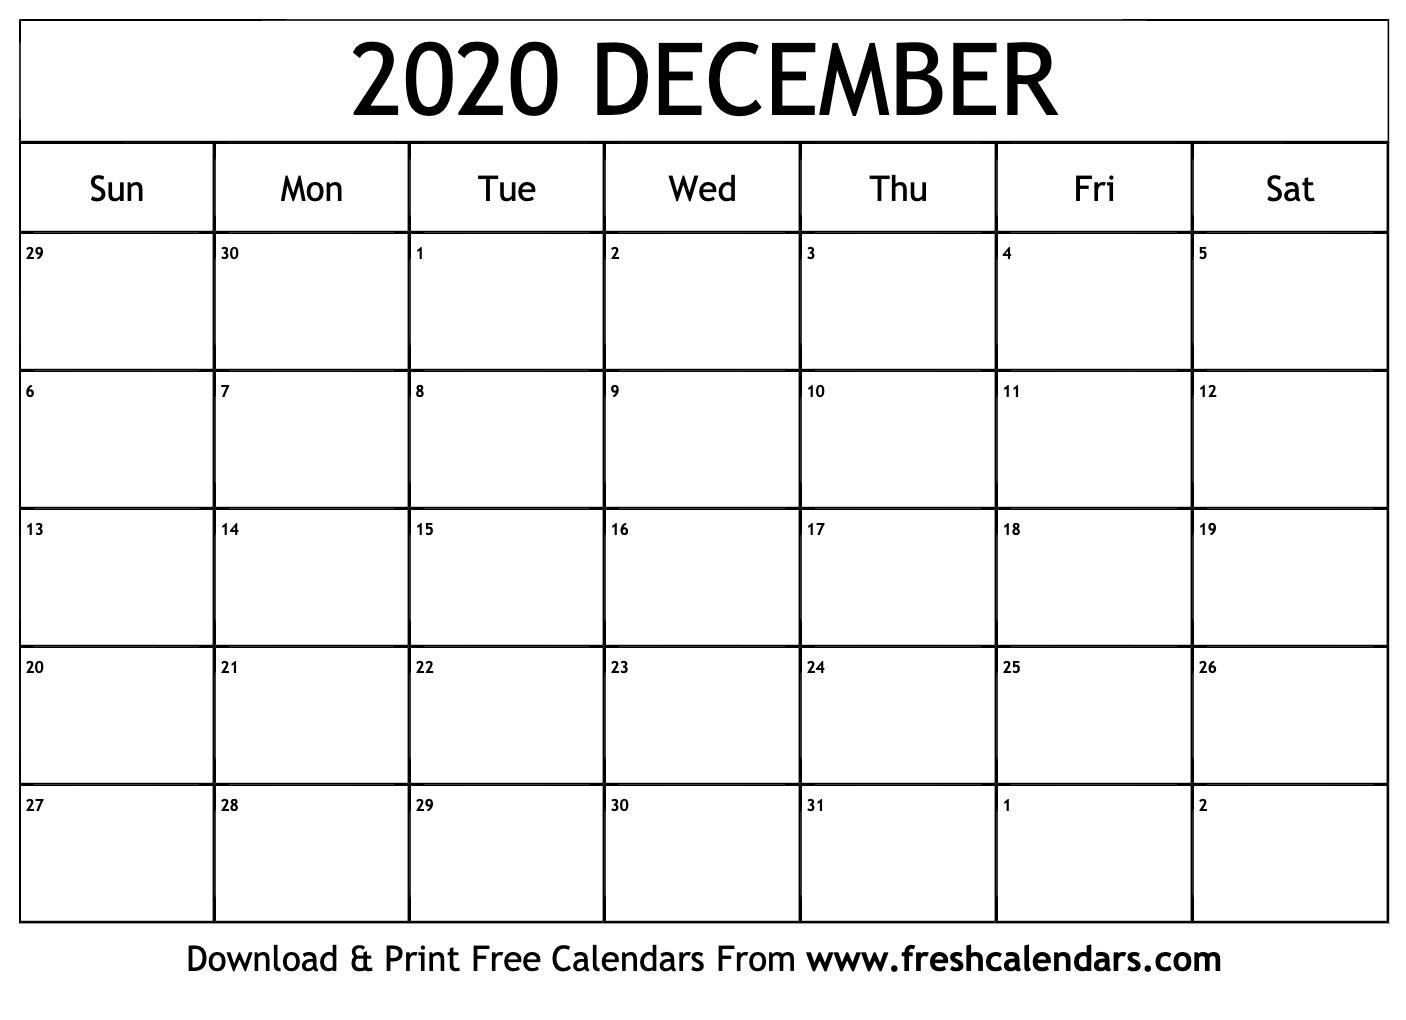 Free Printable December 2020 Calendar inside 123 Calendars December 2020